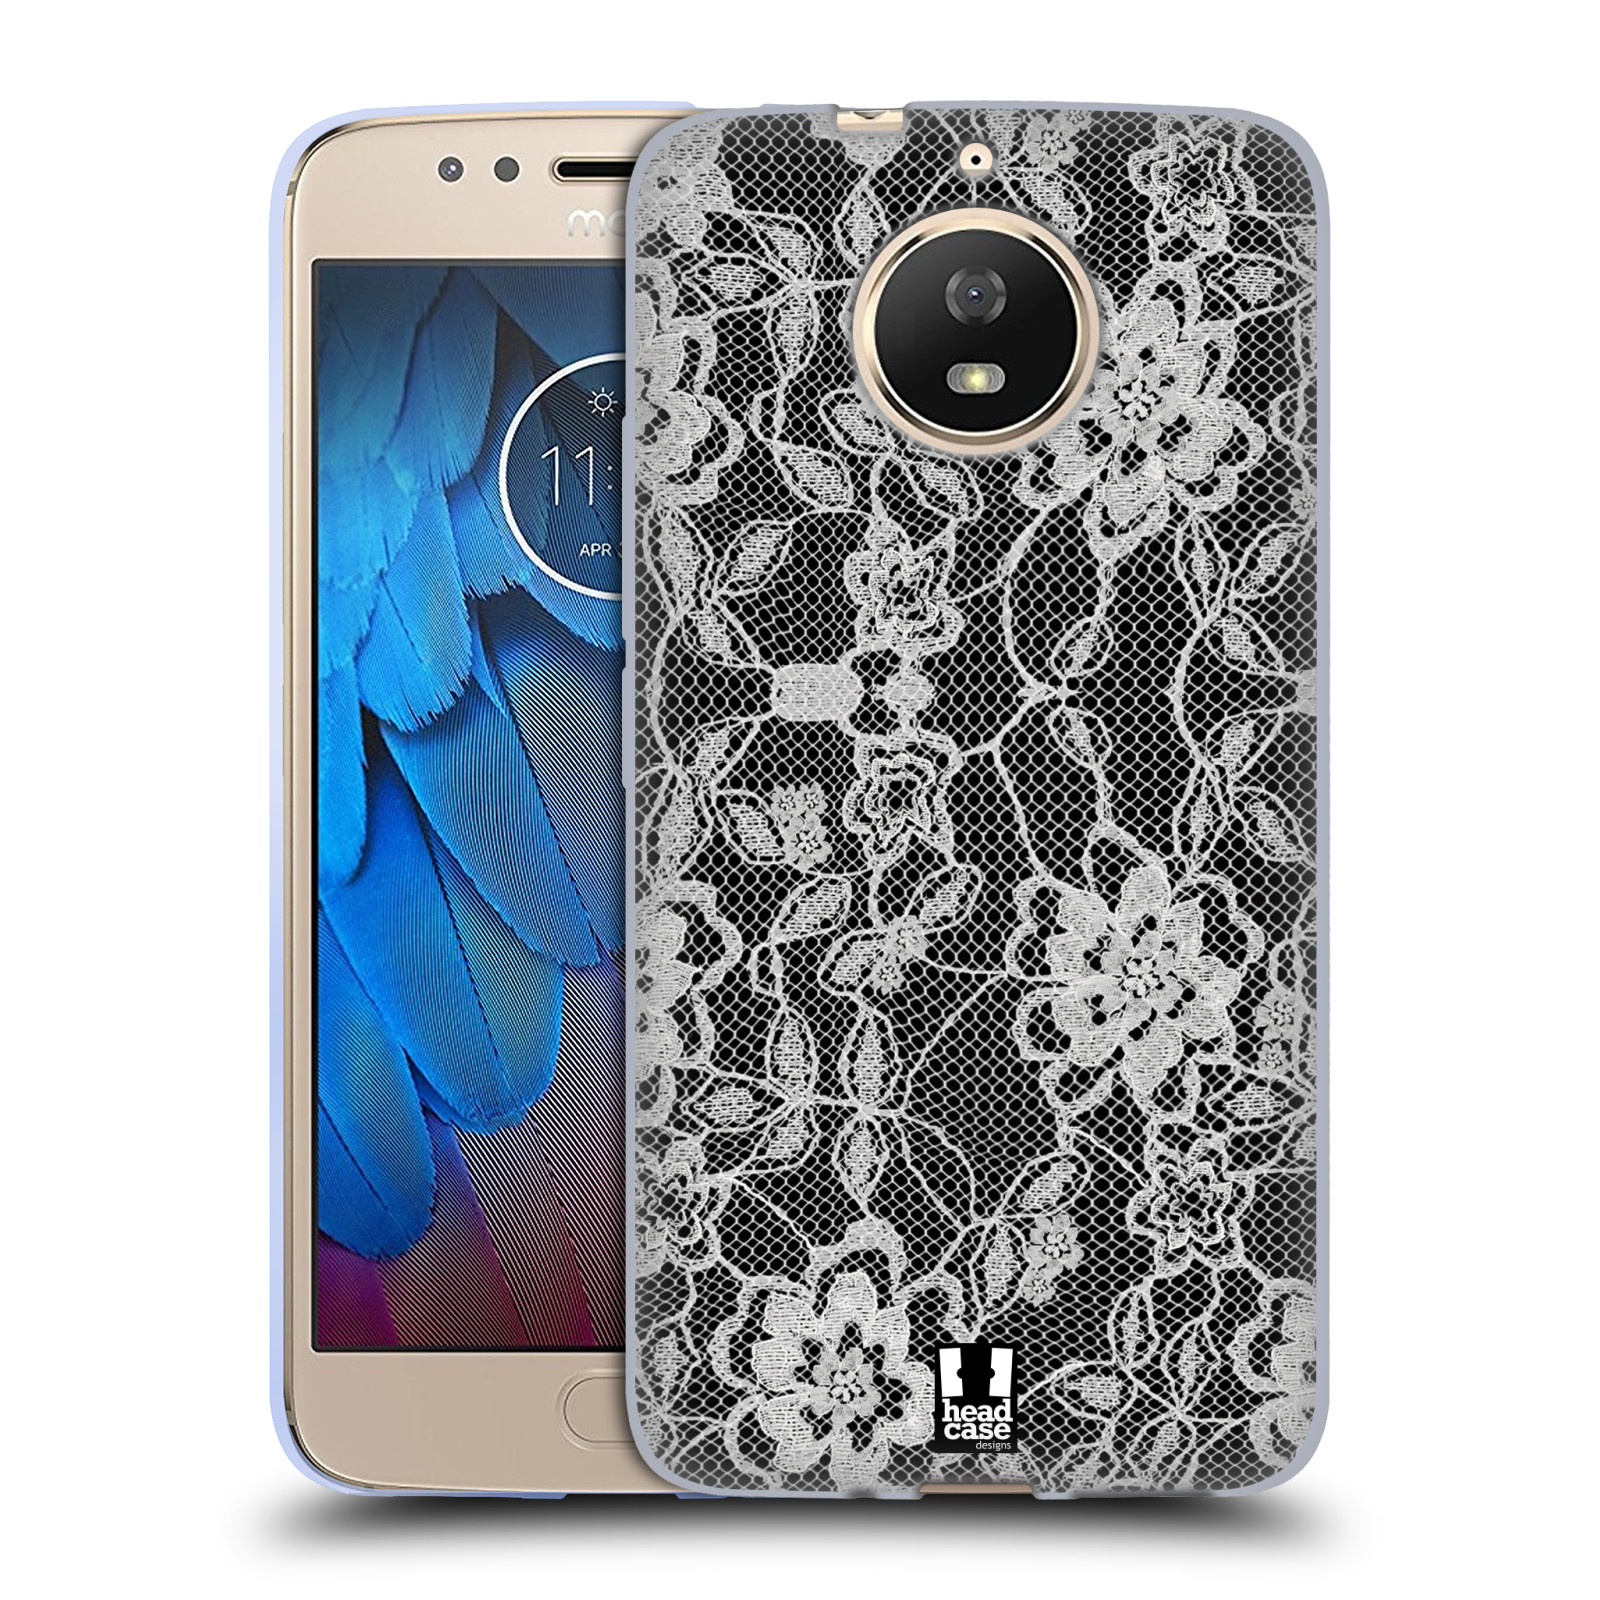 Silikonové pouzdro na mobil Lenovo Moto G5s - Head Case - FLOWERY KRAJKA